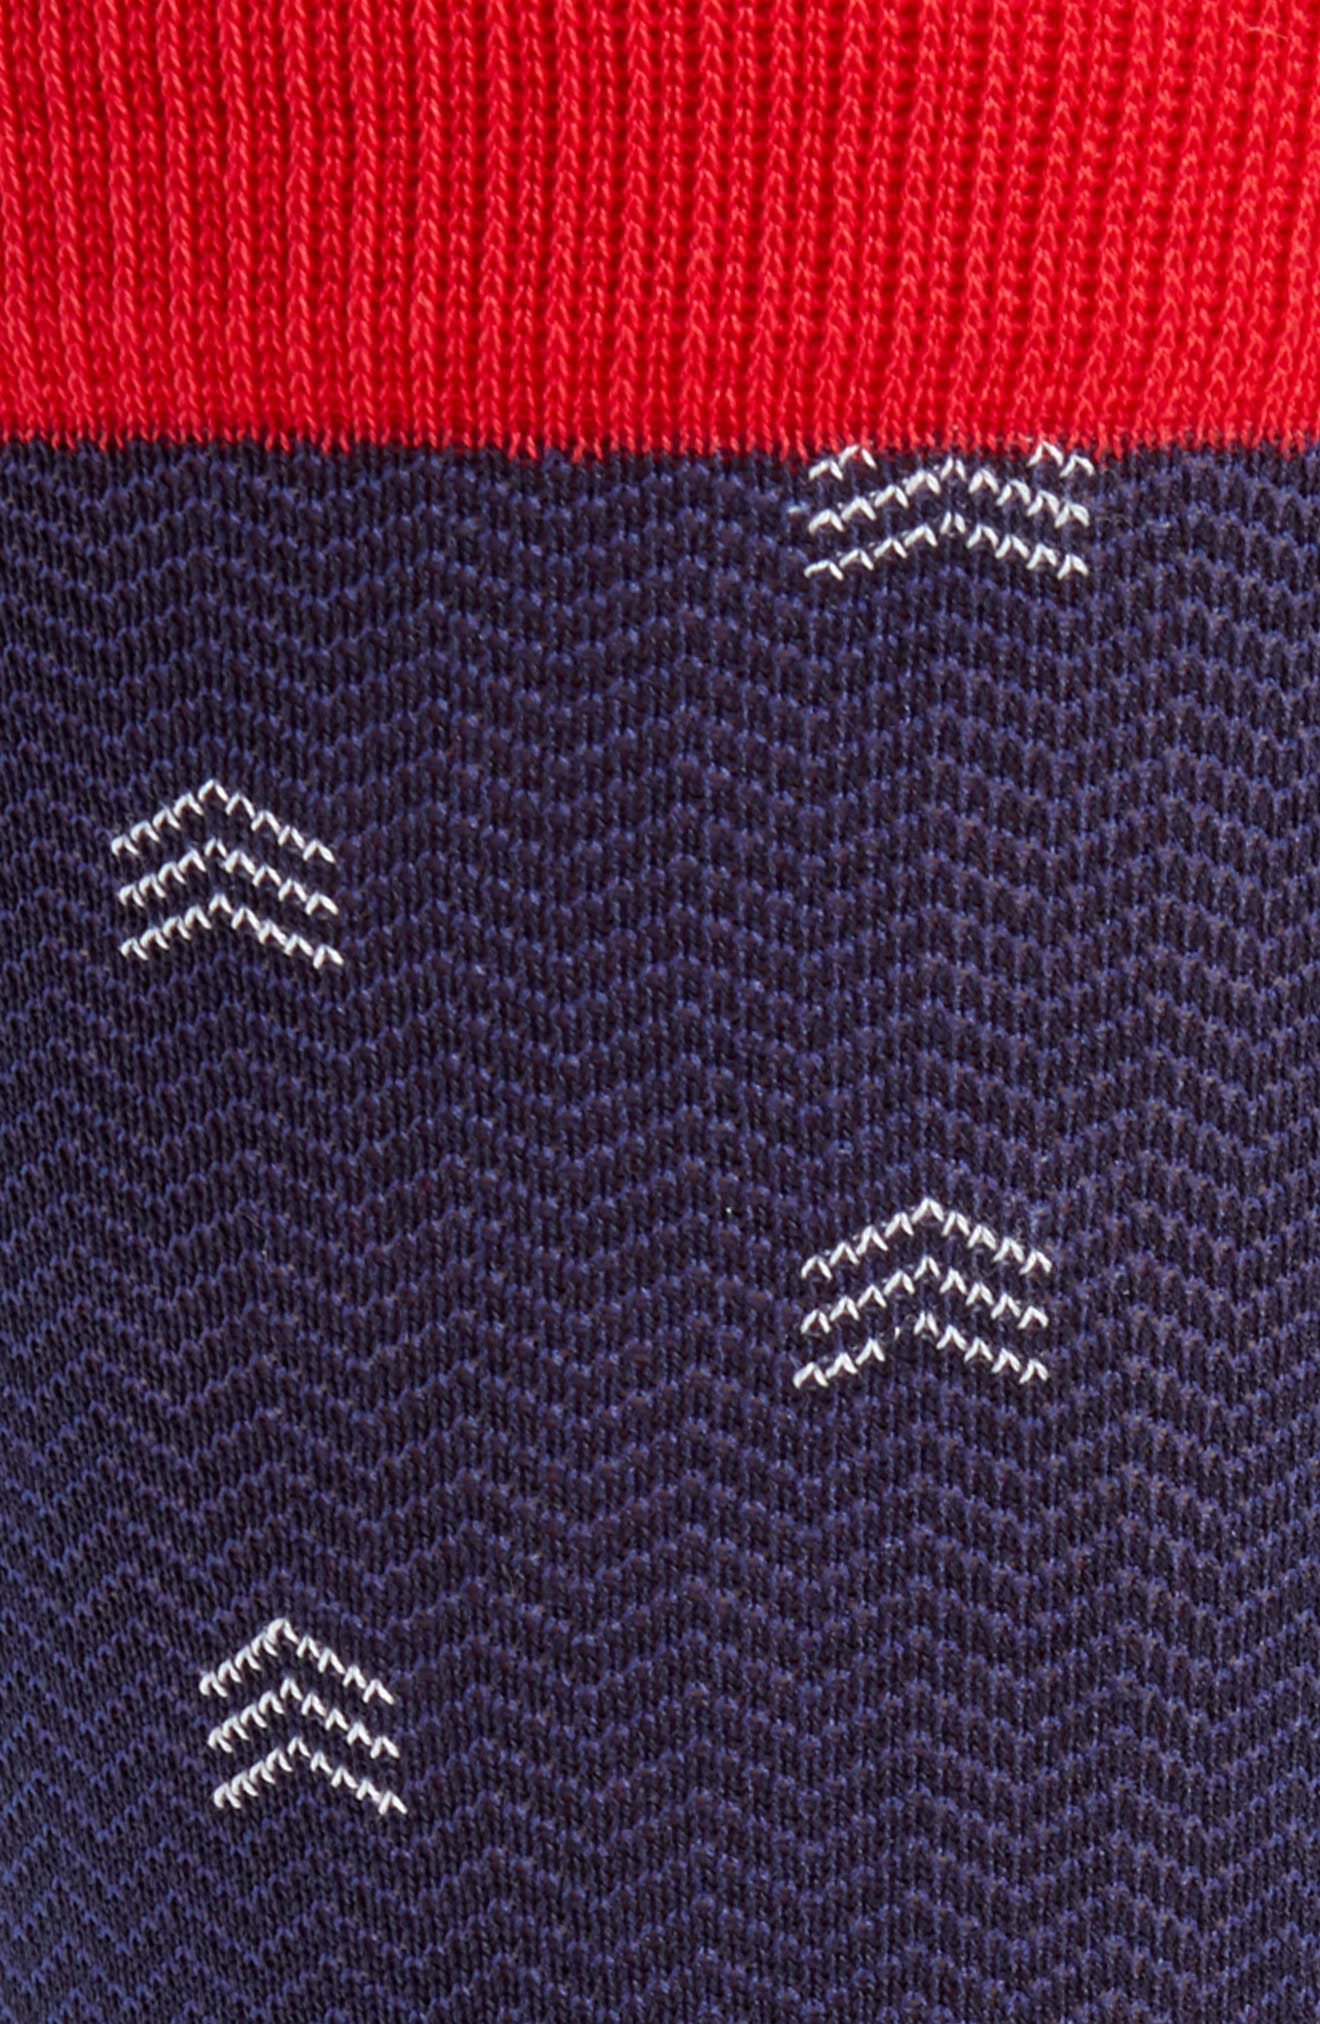 Dancing Chevron Socks,                             Alternate thumbnail 2, color,                             NAVY/ RED